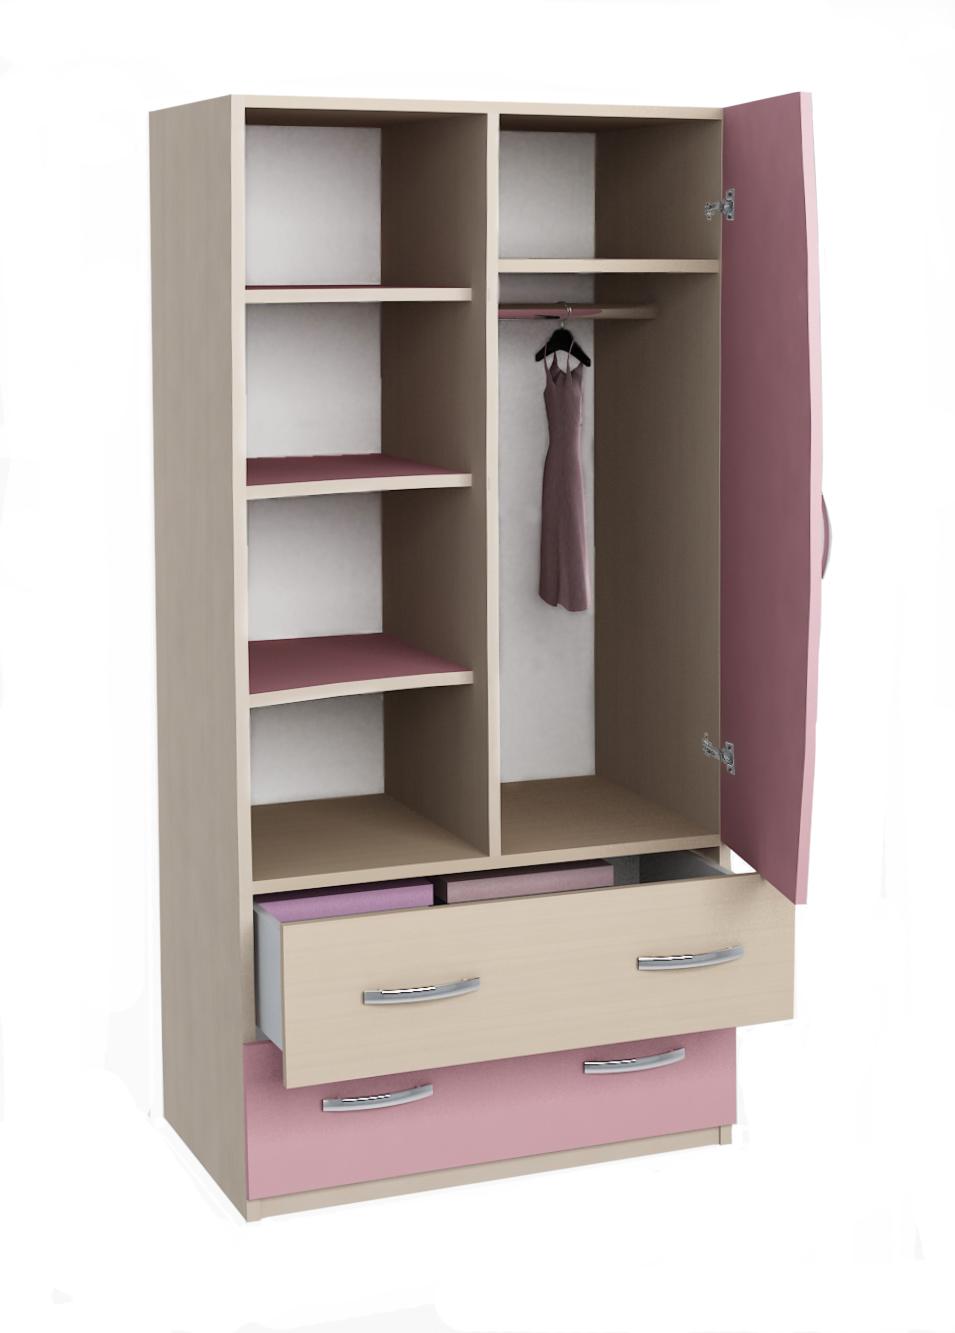 Мебель - шкафы для одежды.